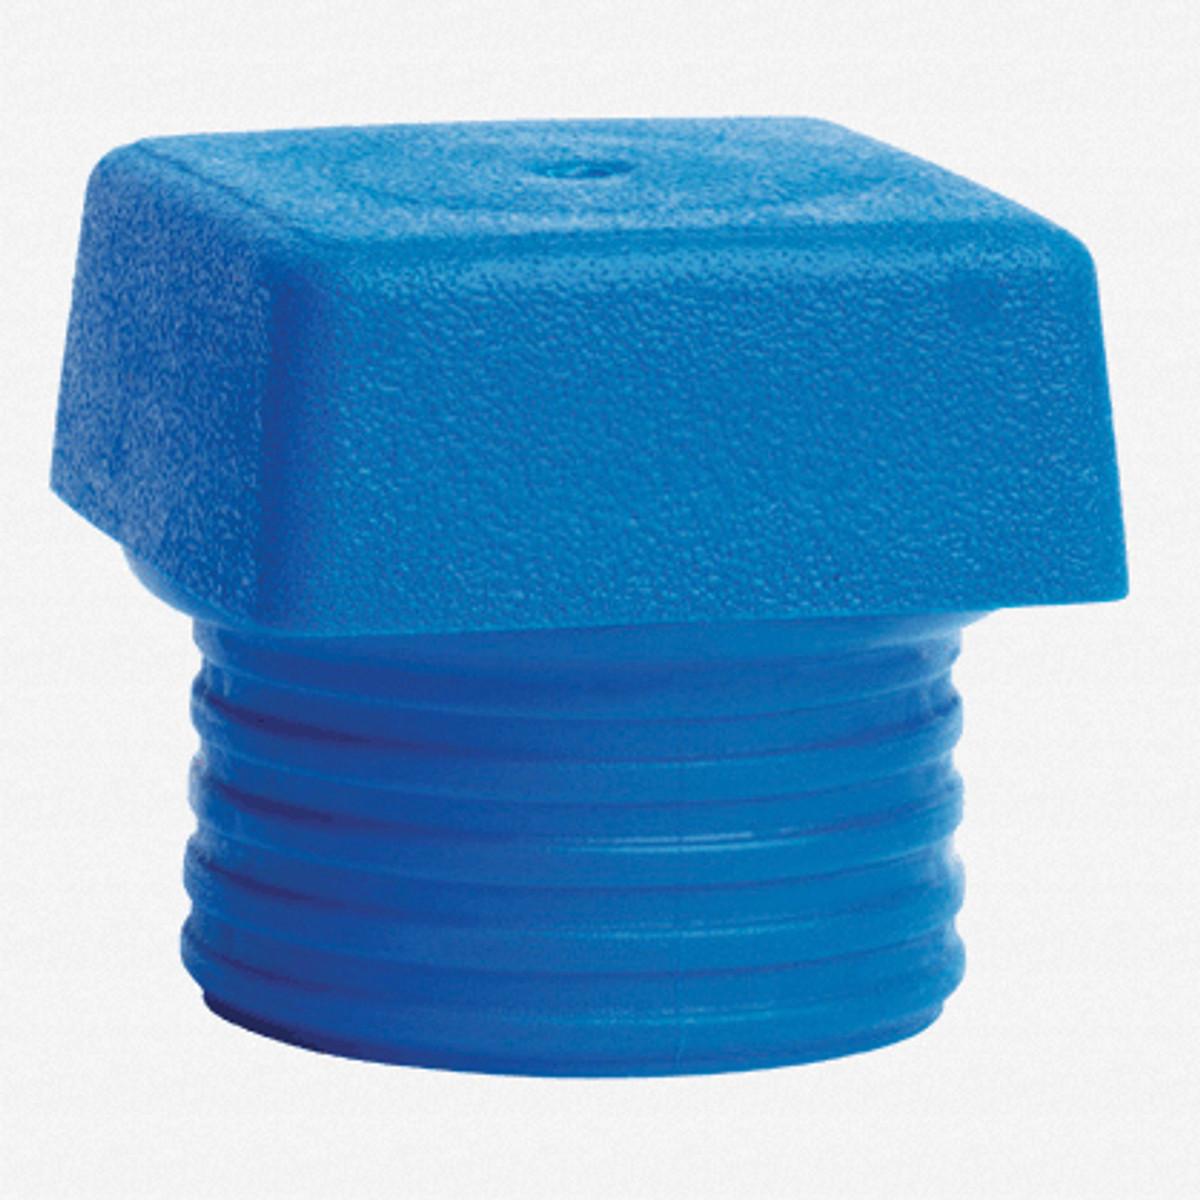 Wiha 83346 40mm Soft Square Face Split Head Mallet - KC Tool